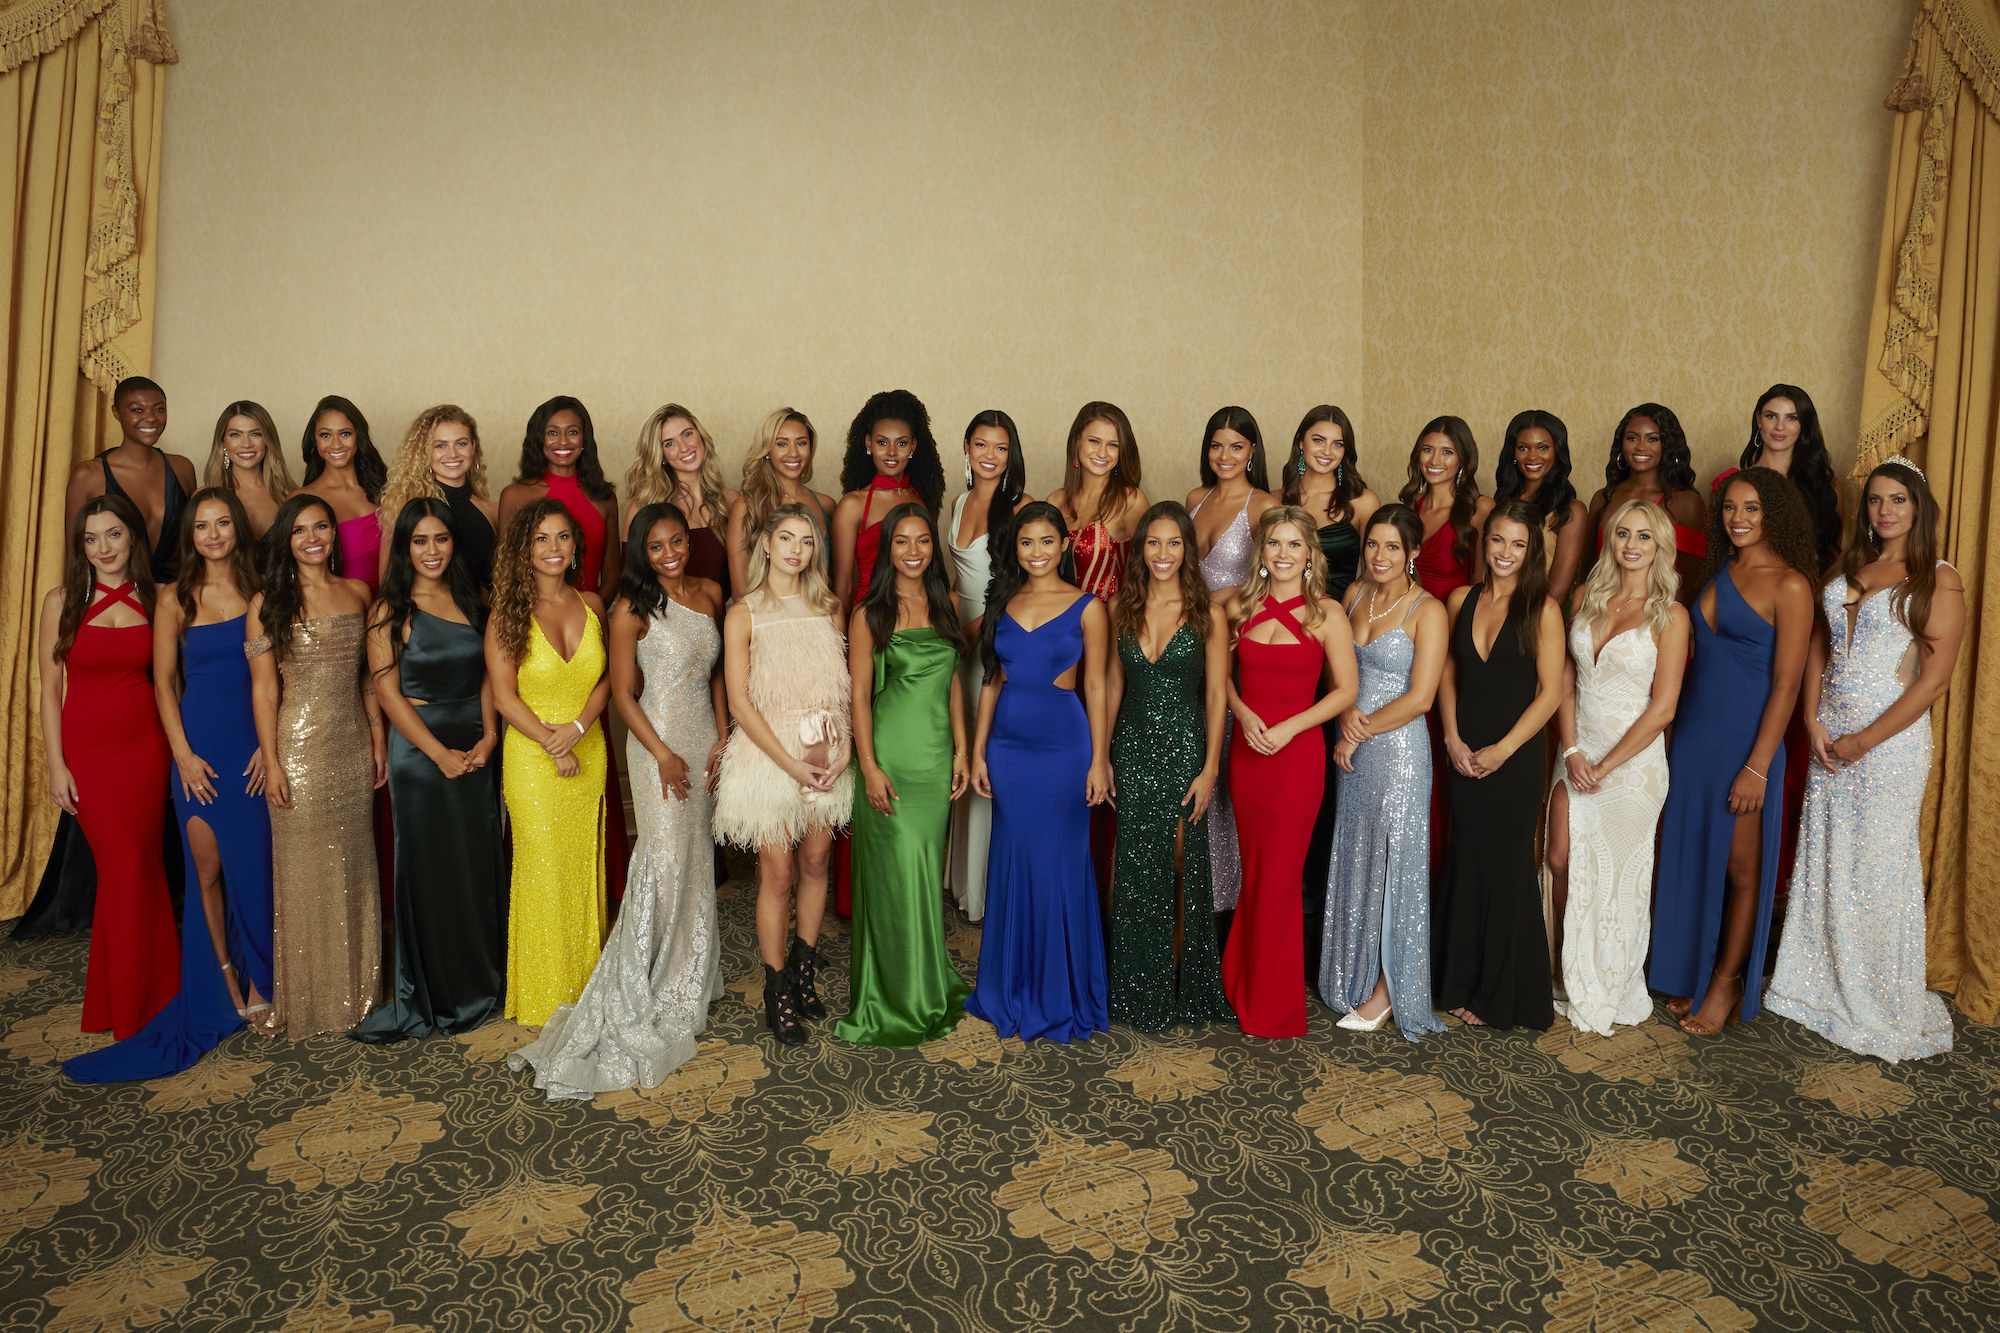 The contestants on season 25 of The Bachelor